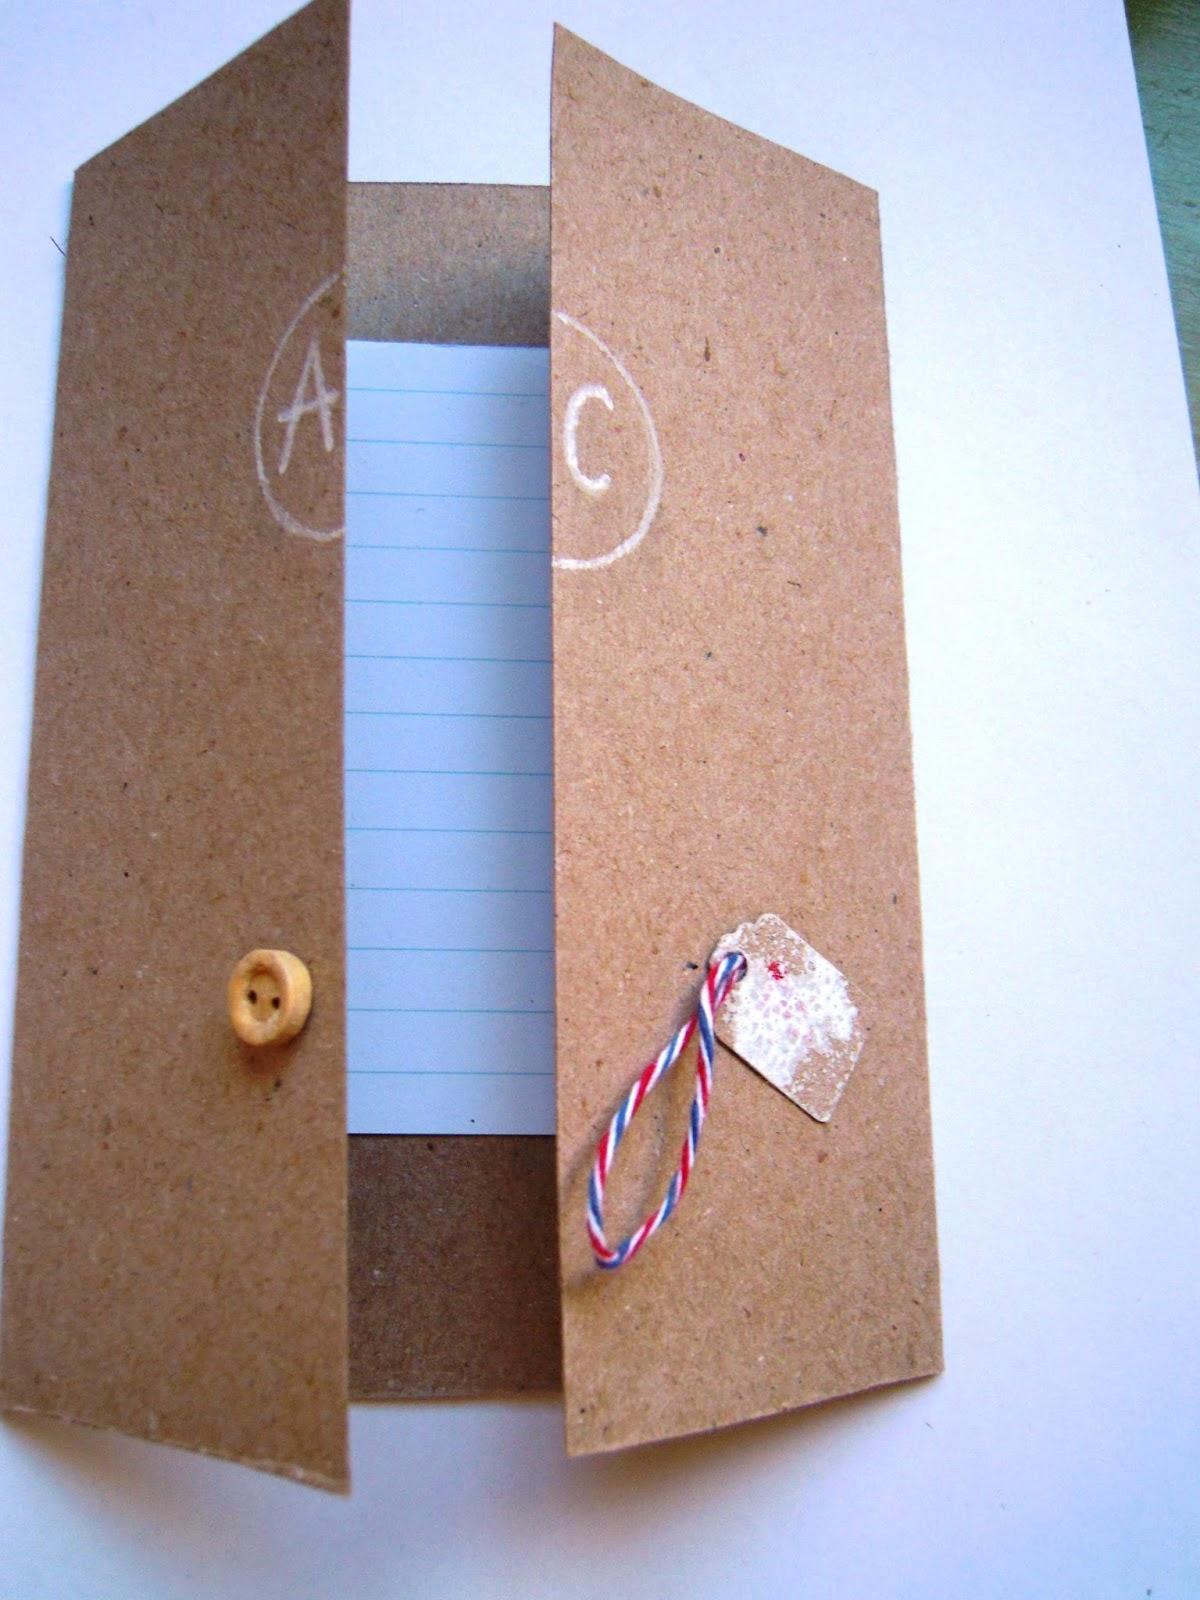 Tarjetas de invitacion hechas a mano paso a paso - Tarjetas de cumpleanos hechas a mano faciles paso a paso ...